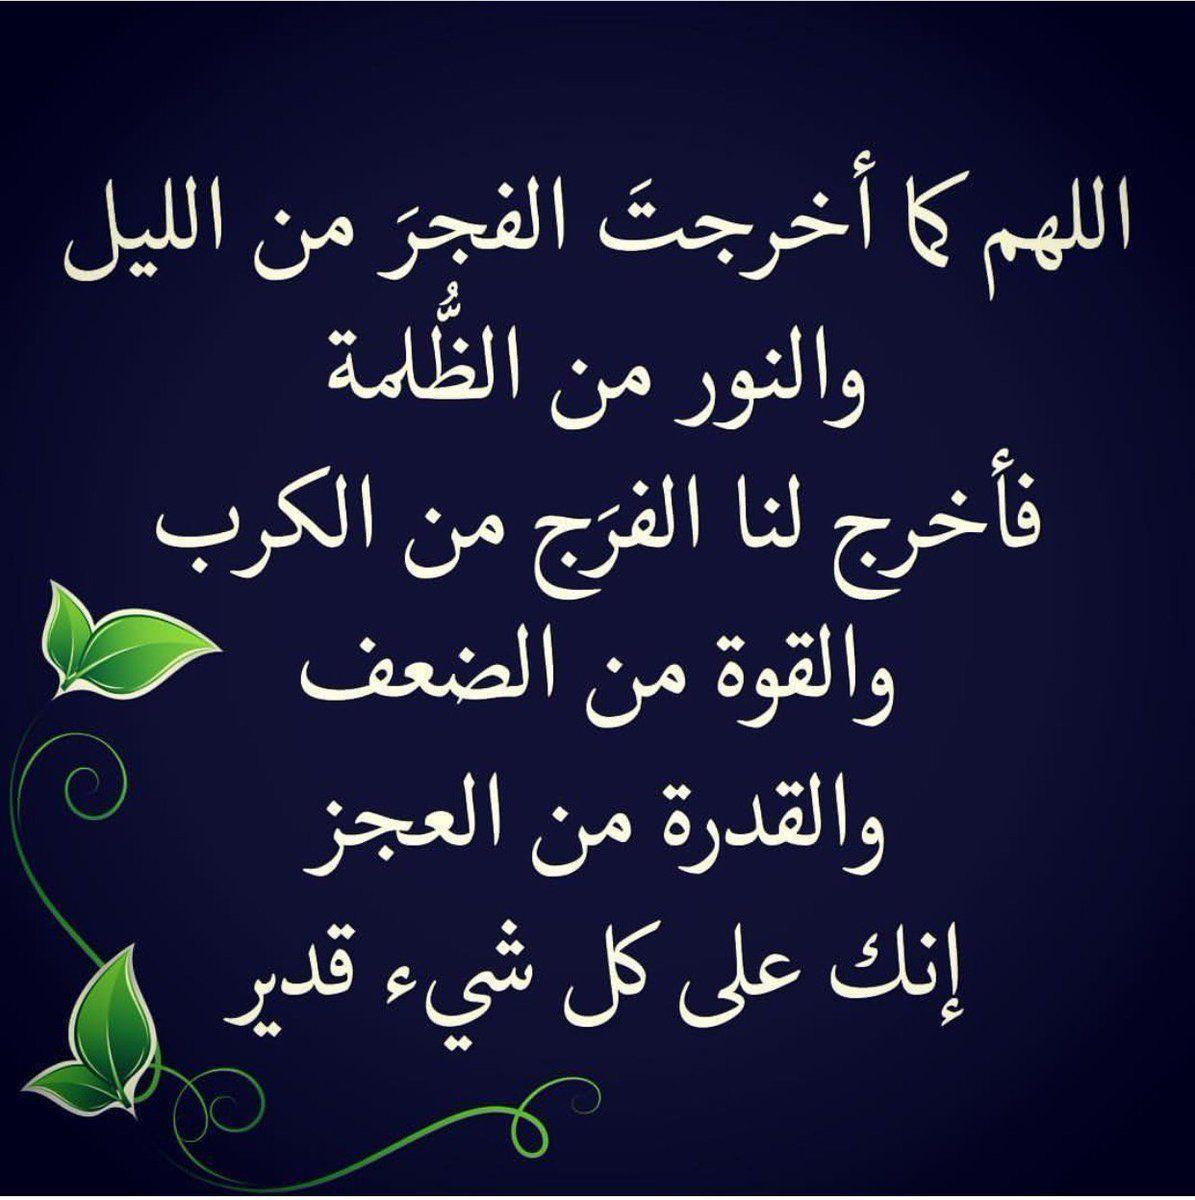 Pin On Prayers Advise